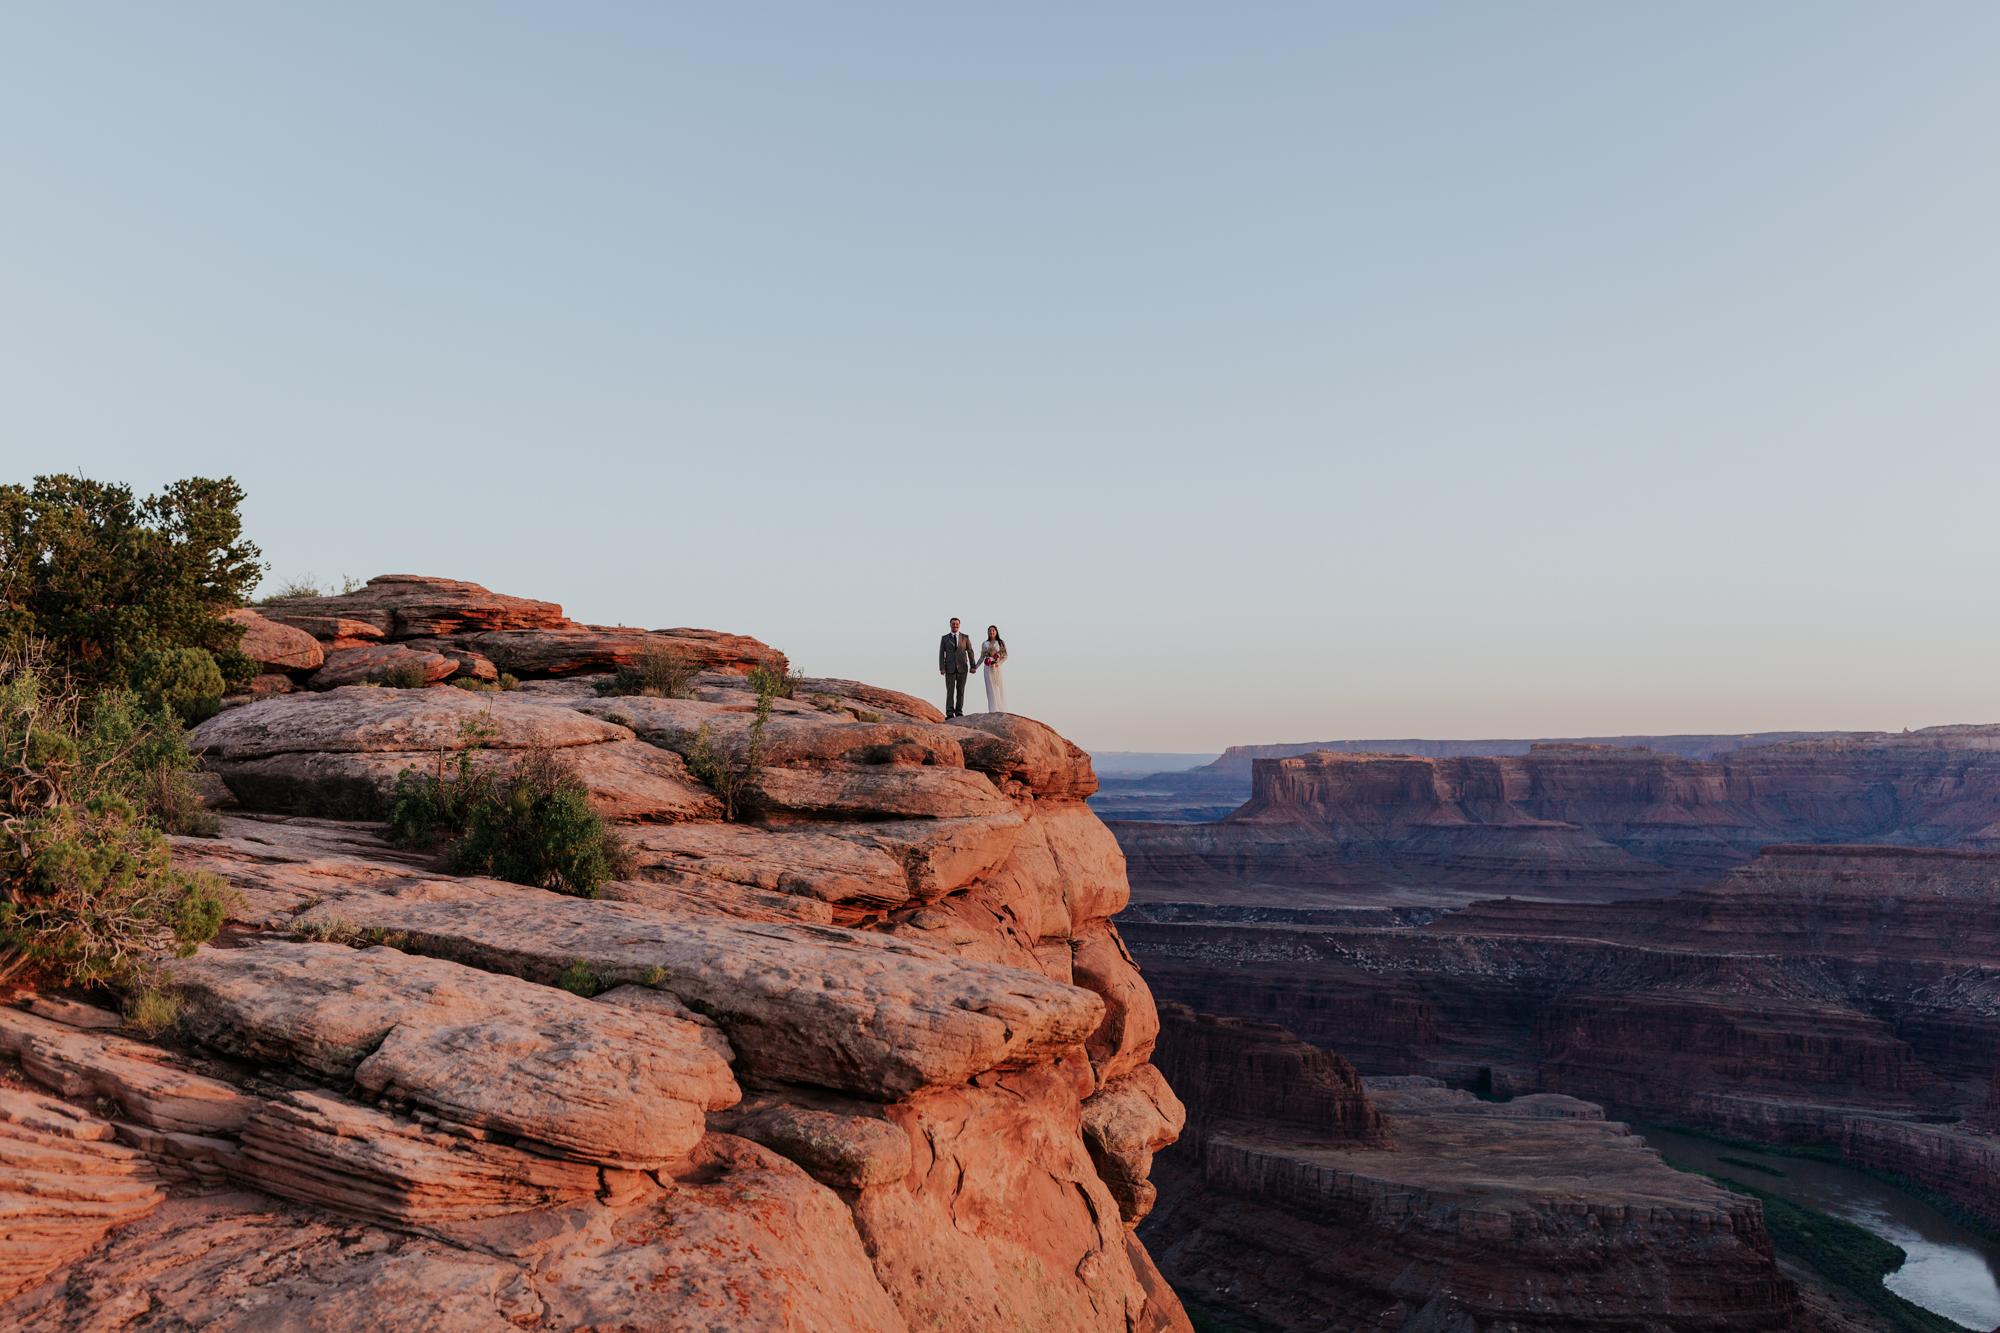 scenic moab utah elopement photographer adventure elopement hiking outdoor elopement outdoor wedding photographer midwest